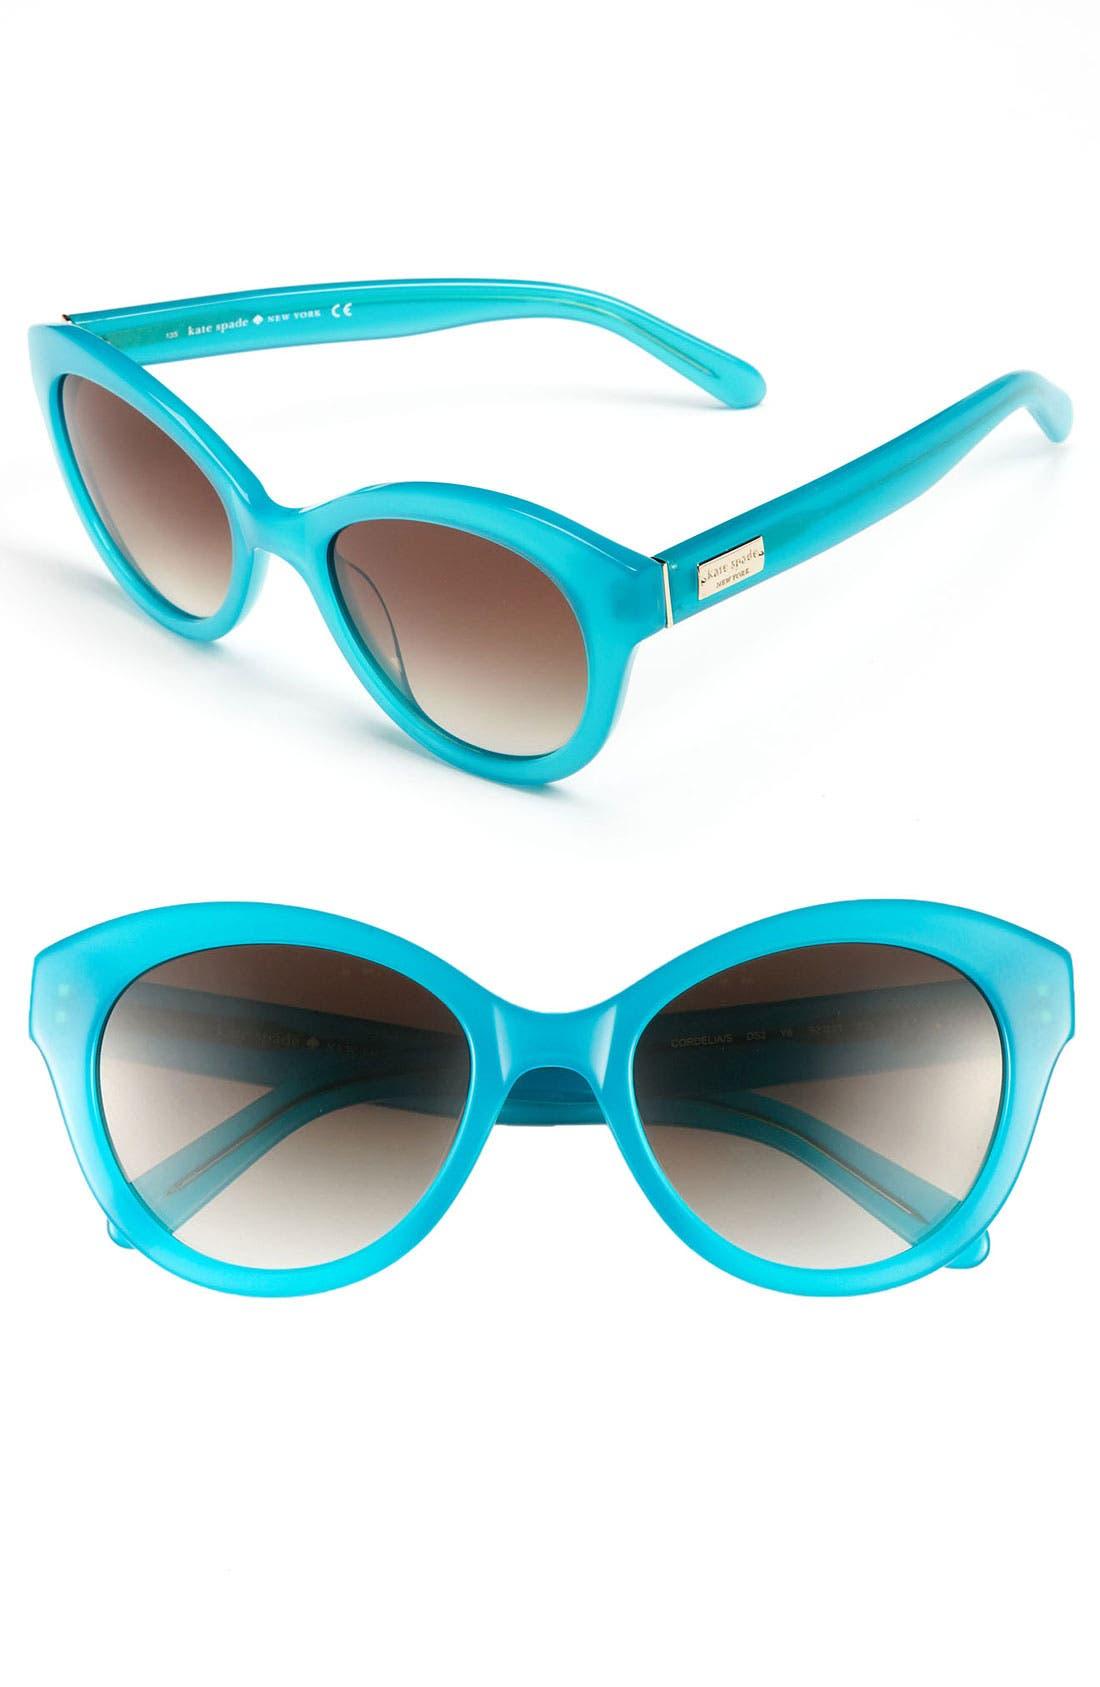 Main Image - kate spade new york 'cordelia' 52mm retro sunglasses